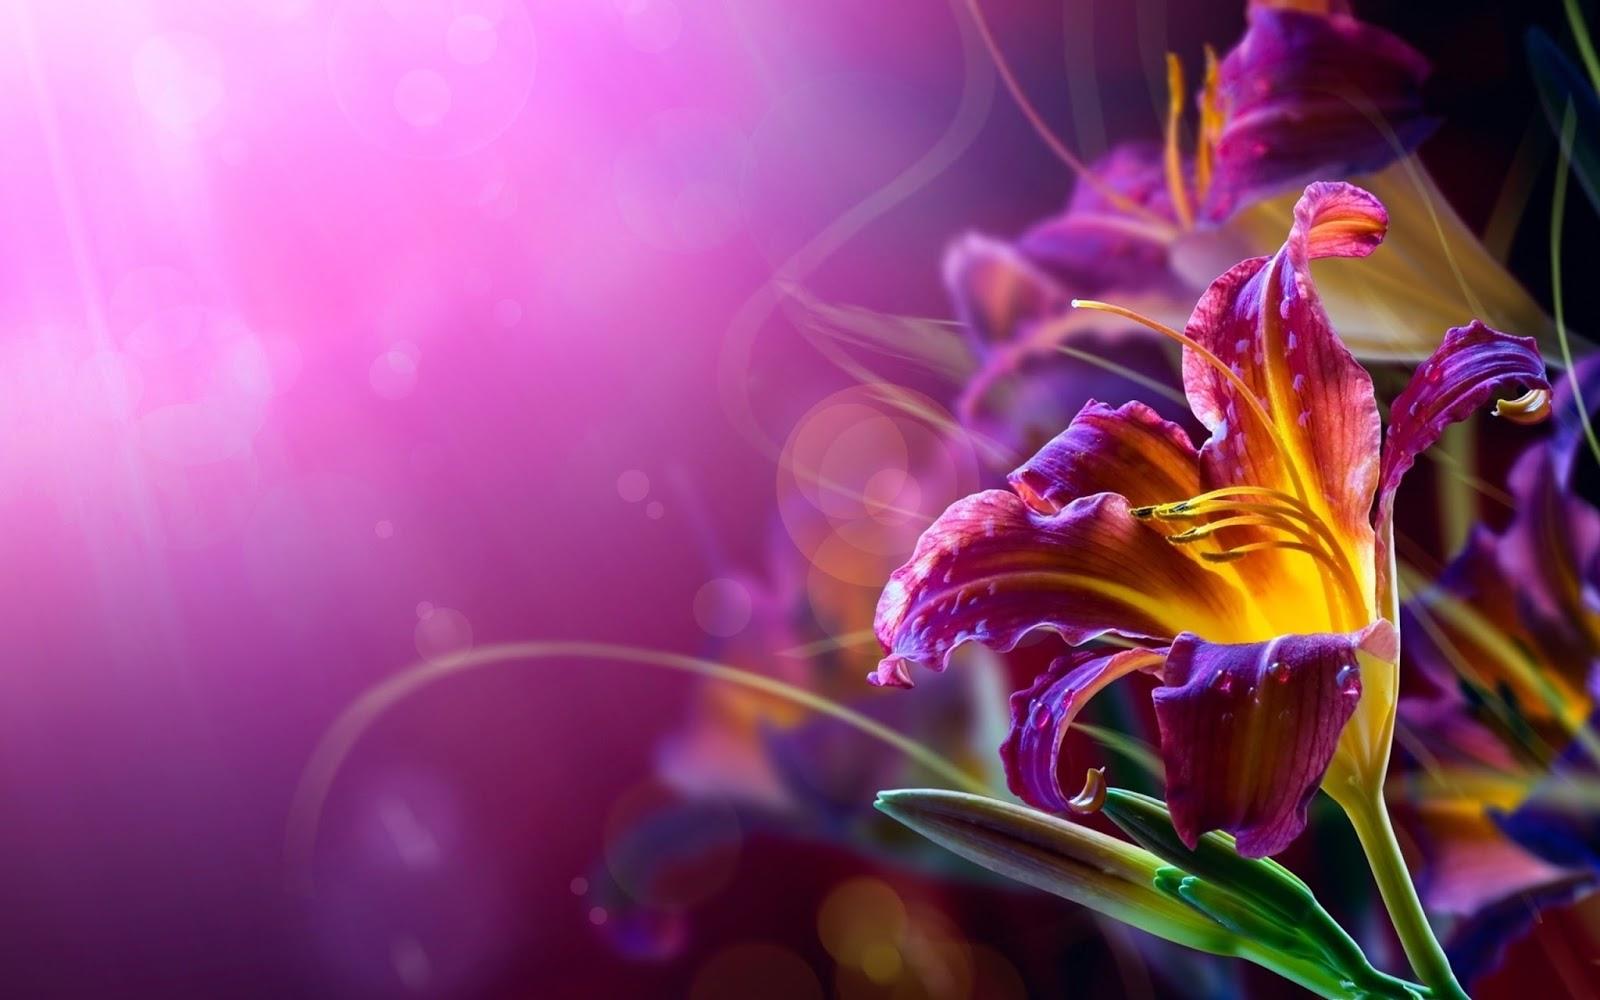 Les plus beau fond ecran fleurs fond ecran pc for Fond ecran free